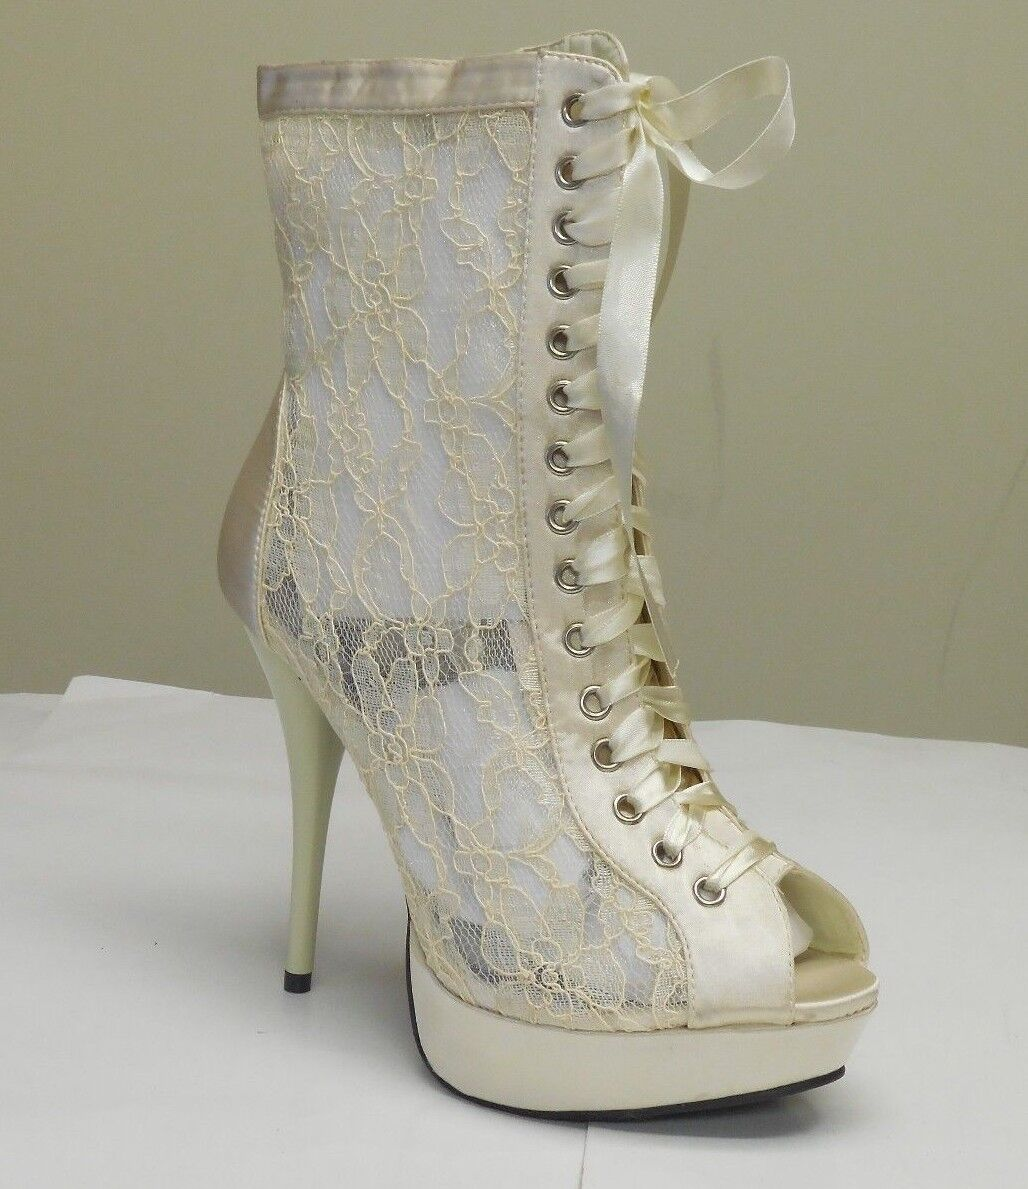 De Blossom Women's Mandy-35 Ivory Lace Net See Through Peep Toe Heels